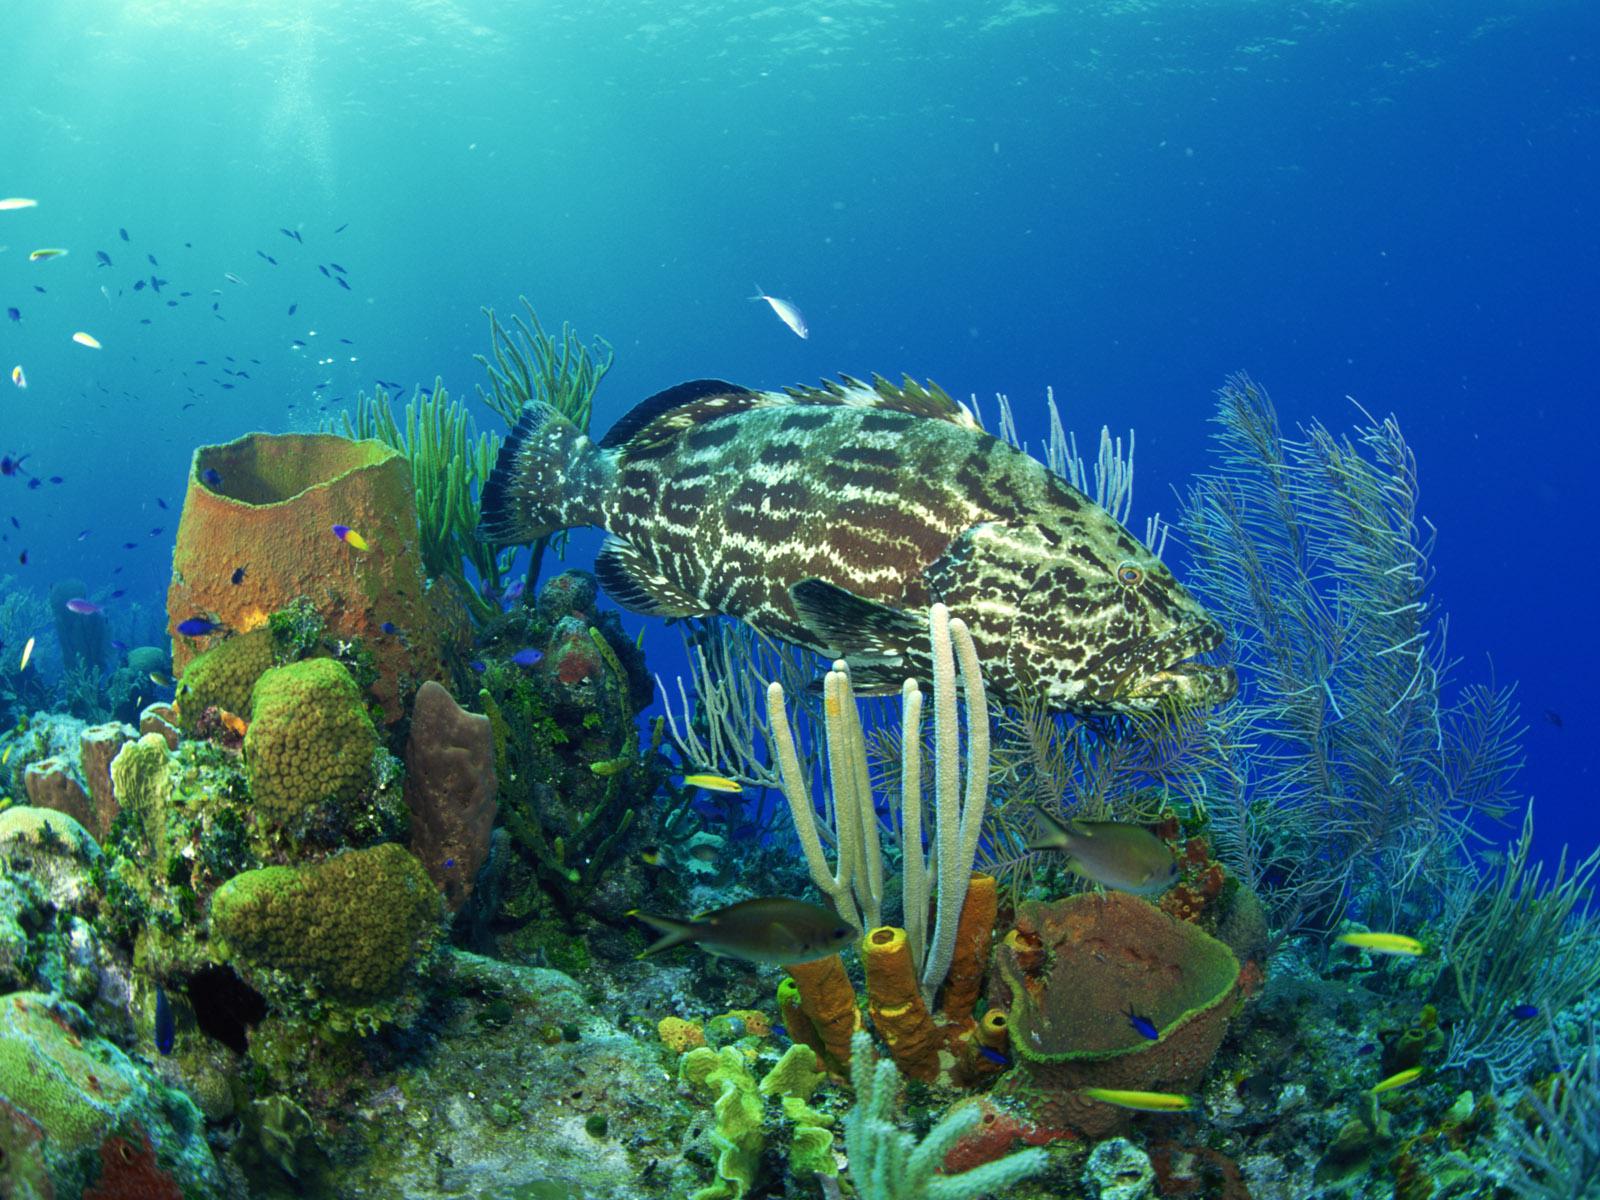 gambar ikan di laut - gambar ikan - gambar ikan di laut